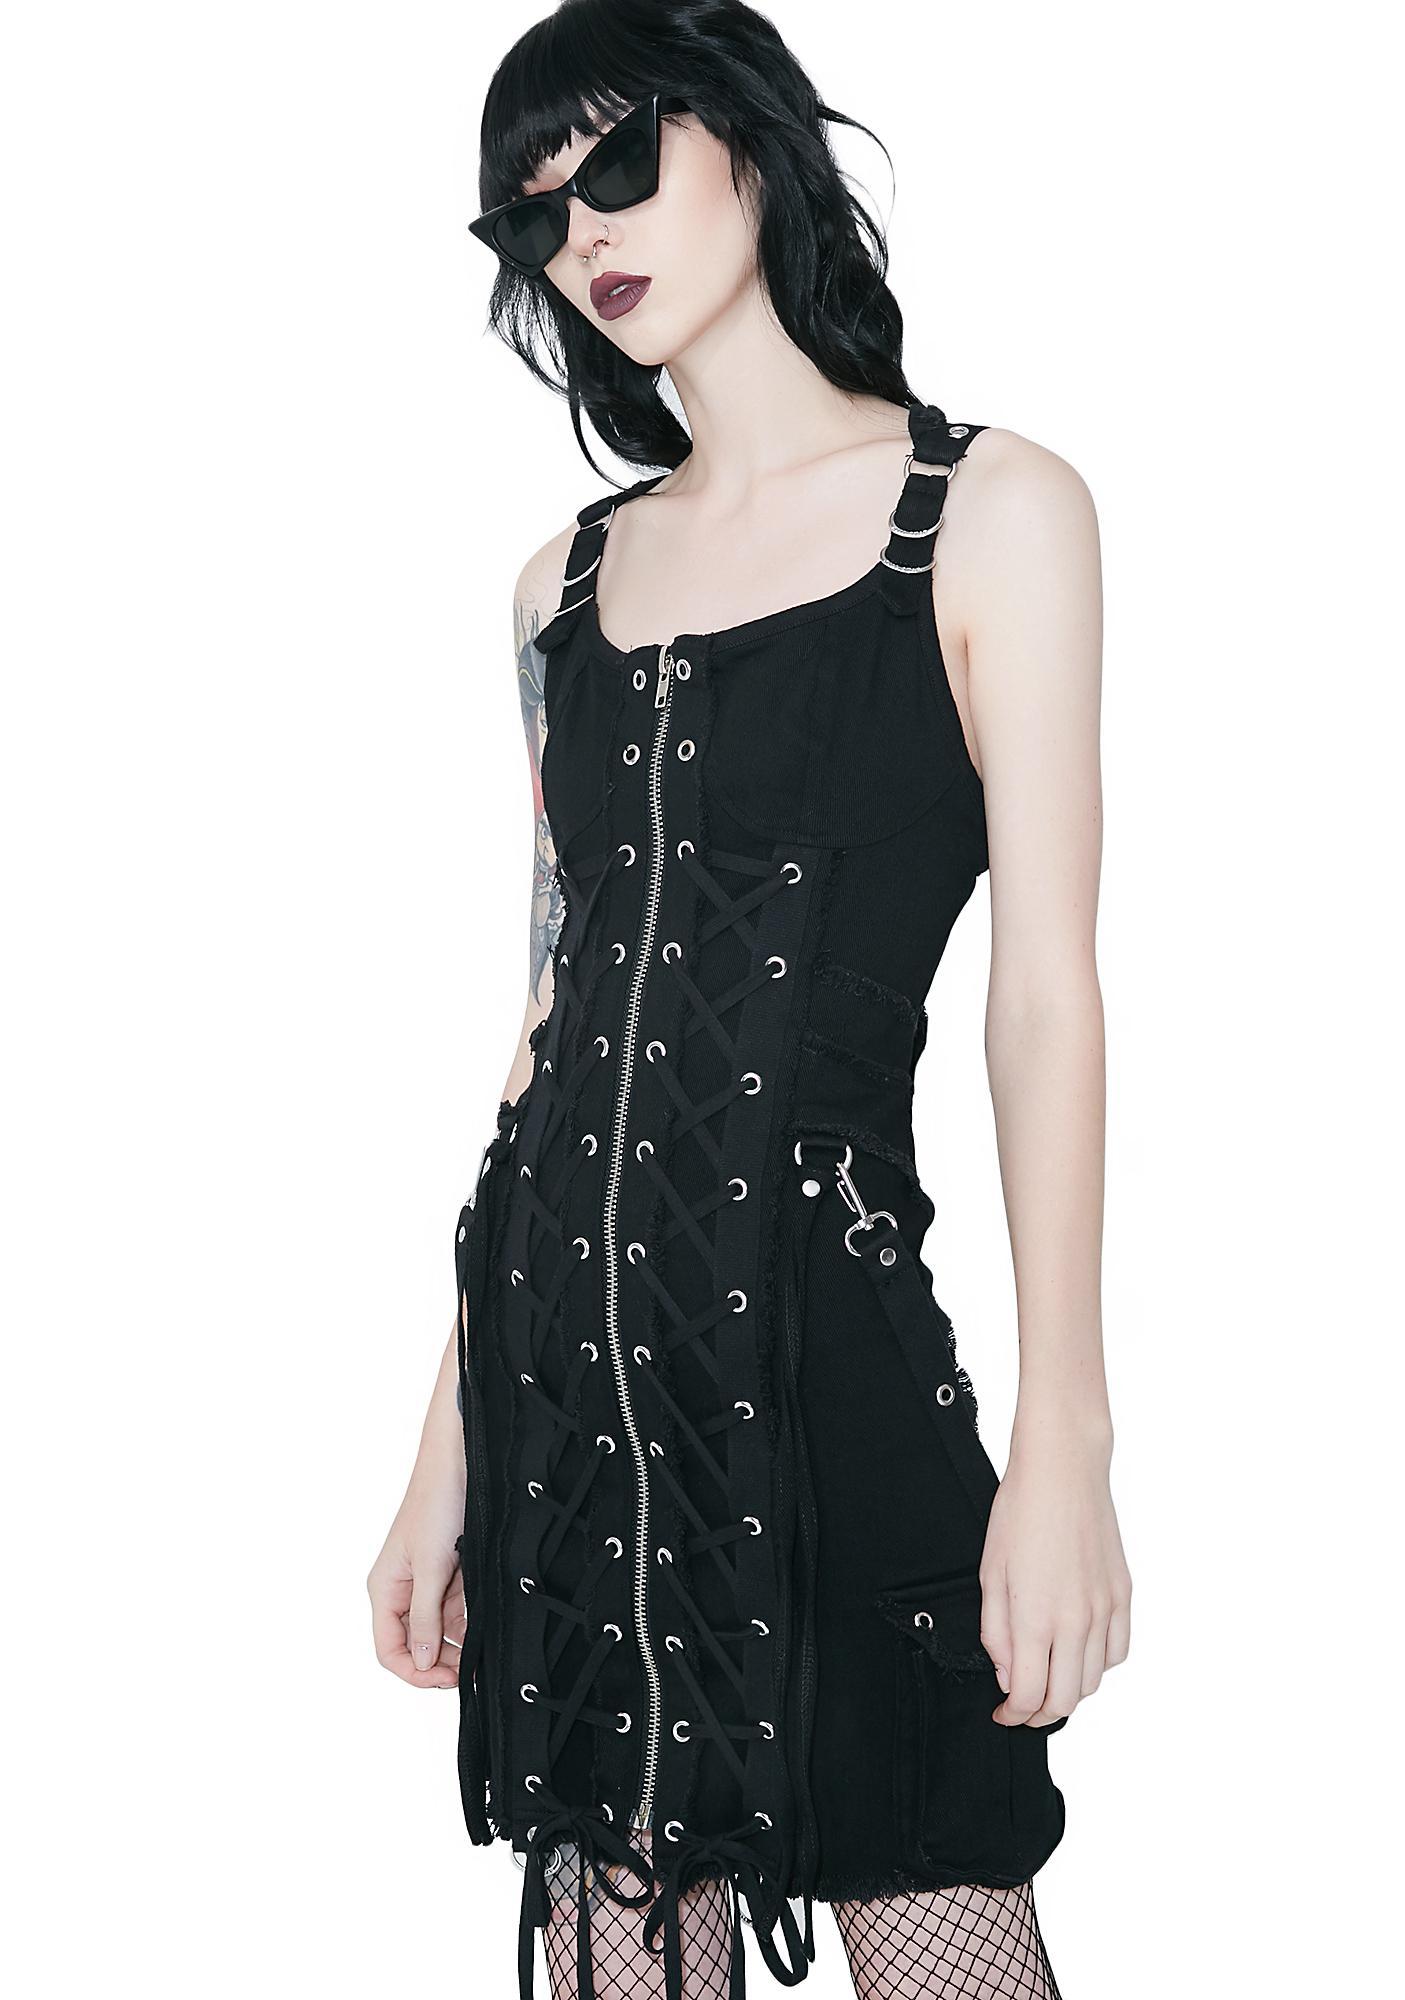 Hella Httpswww Bing Comform Z9fd1: Killstar Sinder Hella Burner Dress